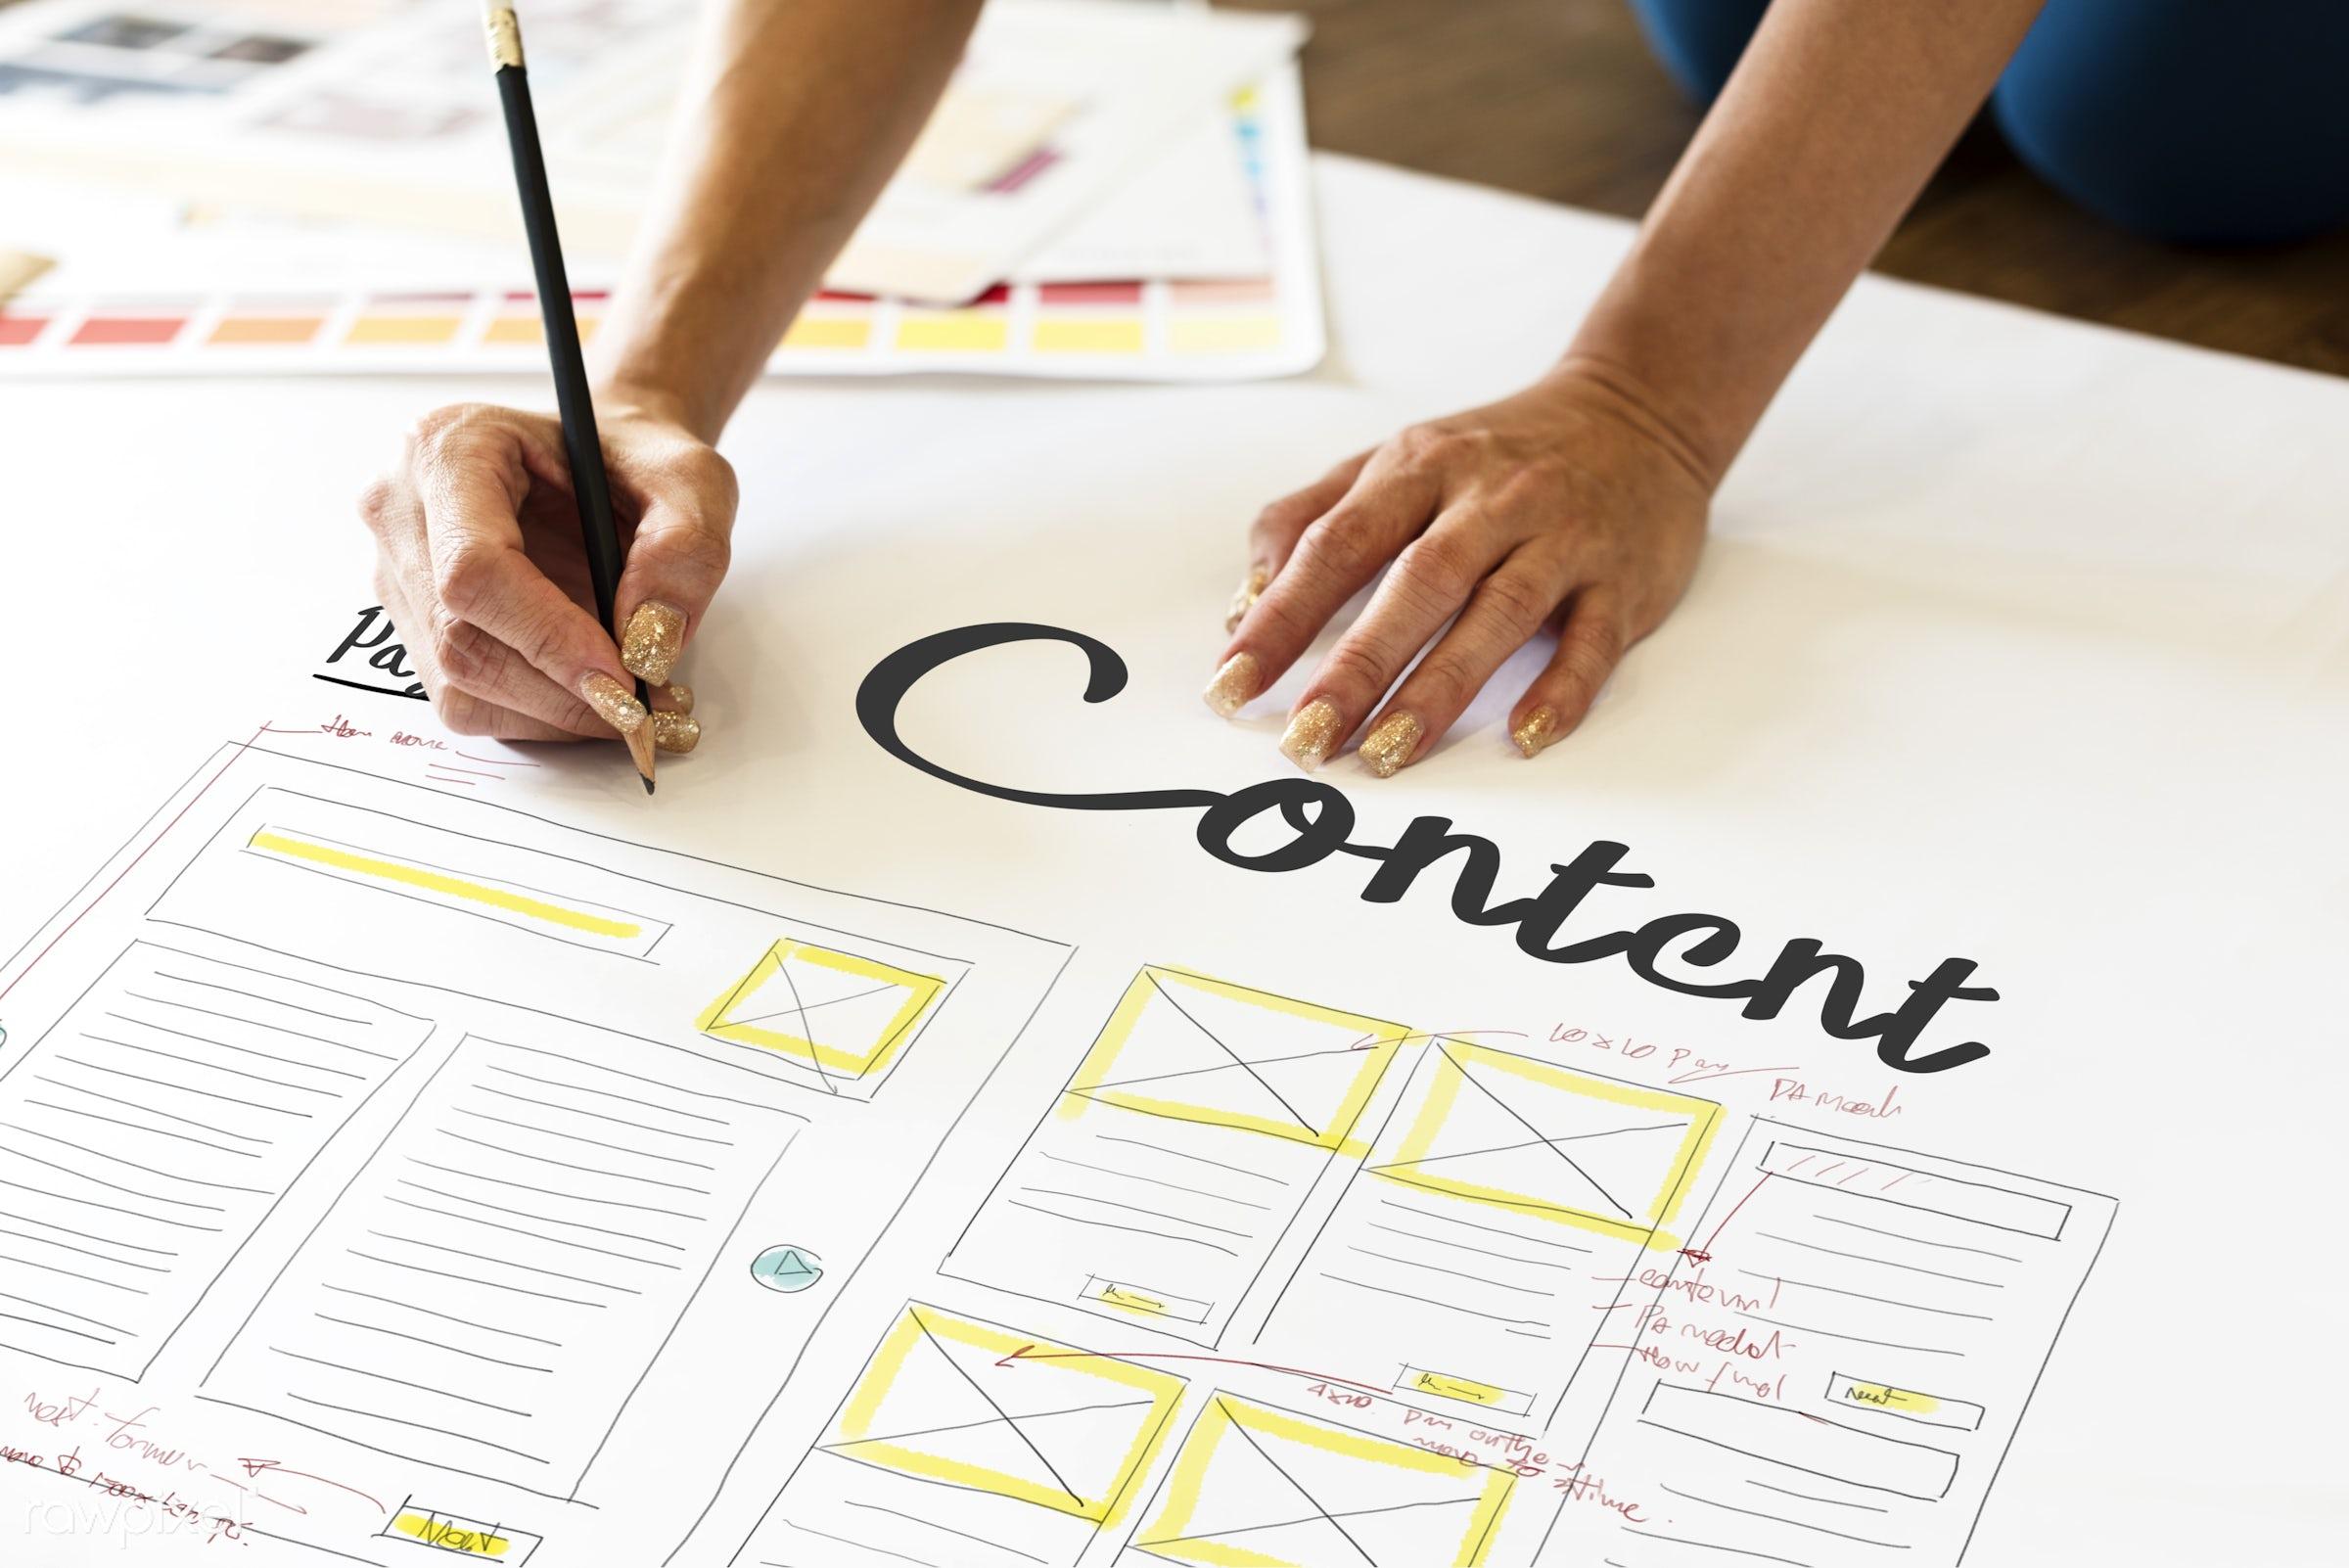 art, connection, content, creation, creative, creative design, creativity, design, developer, drawing, hands, ideas,...